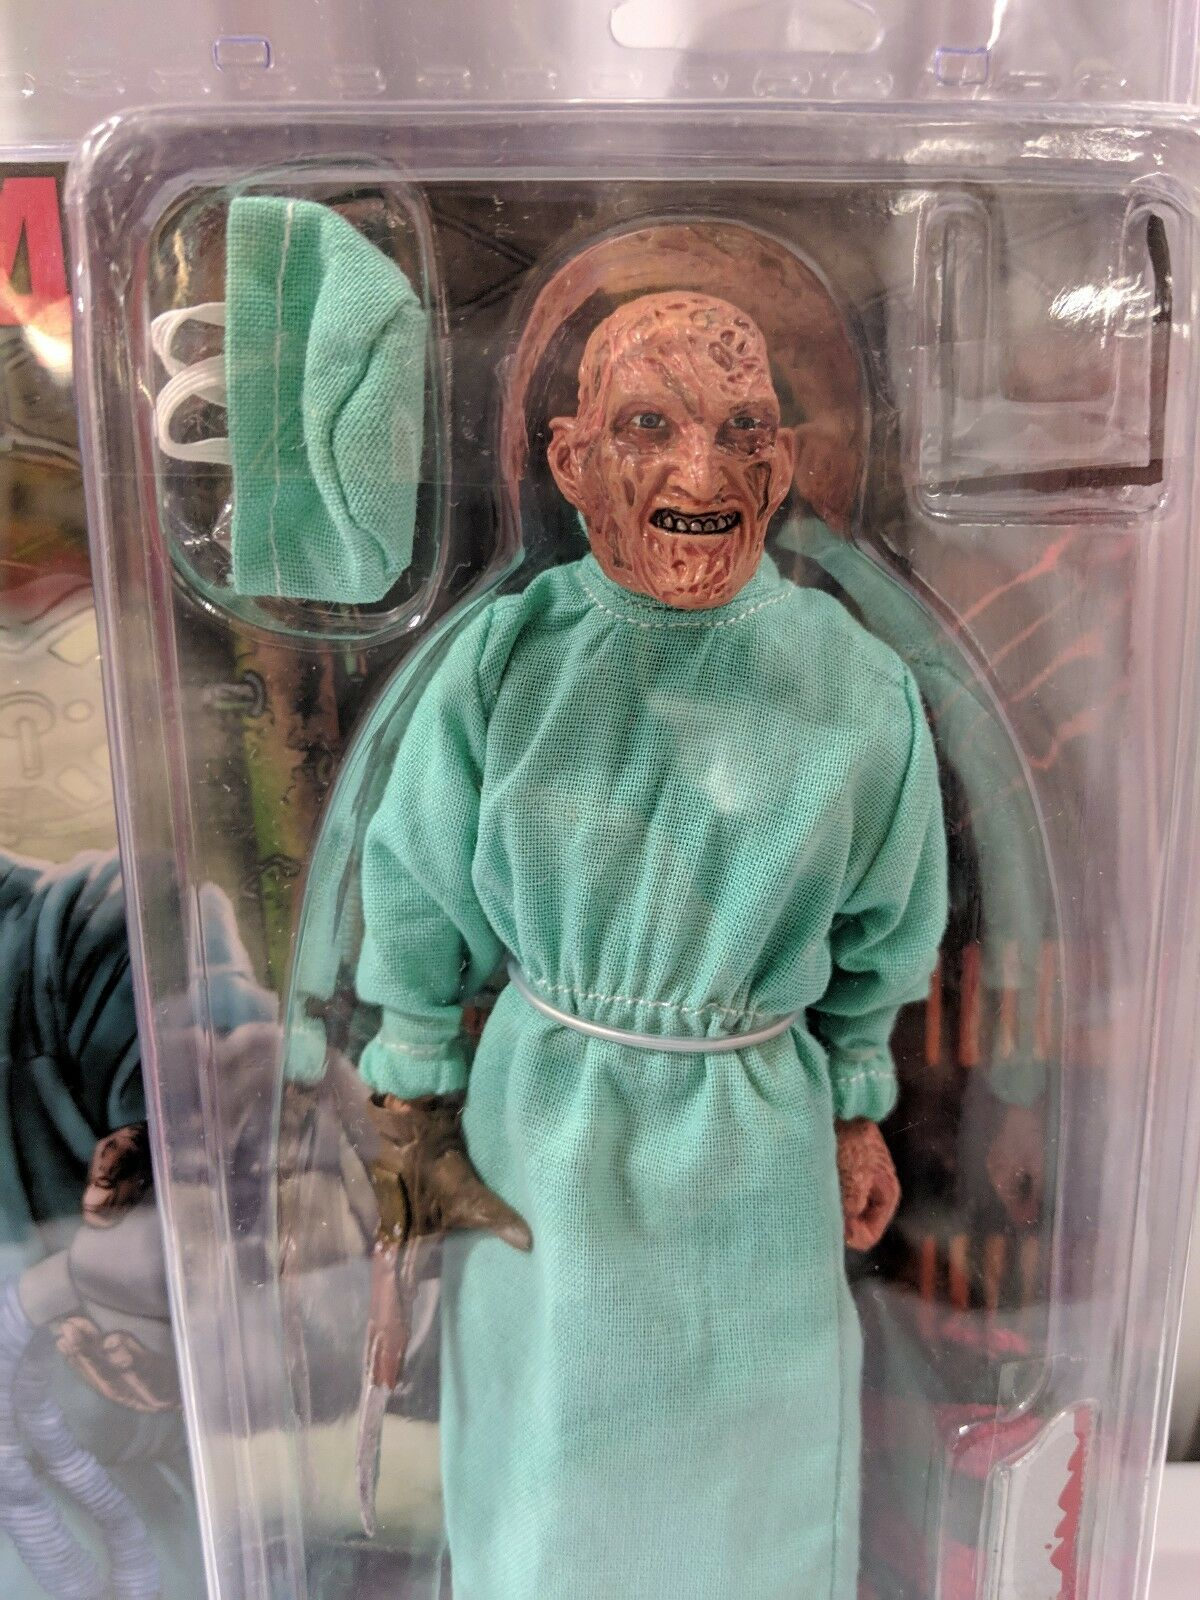 NECA Nightmare on elm street 4. Freddy Krueger Doctor